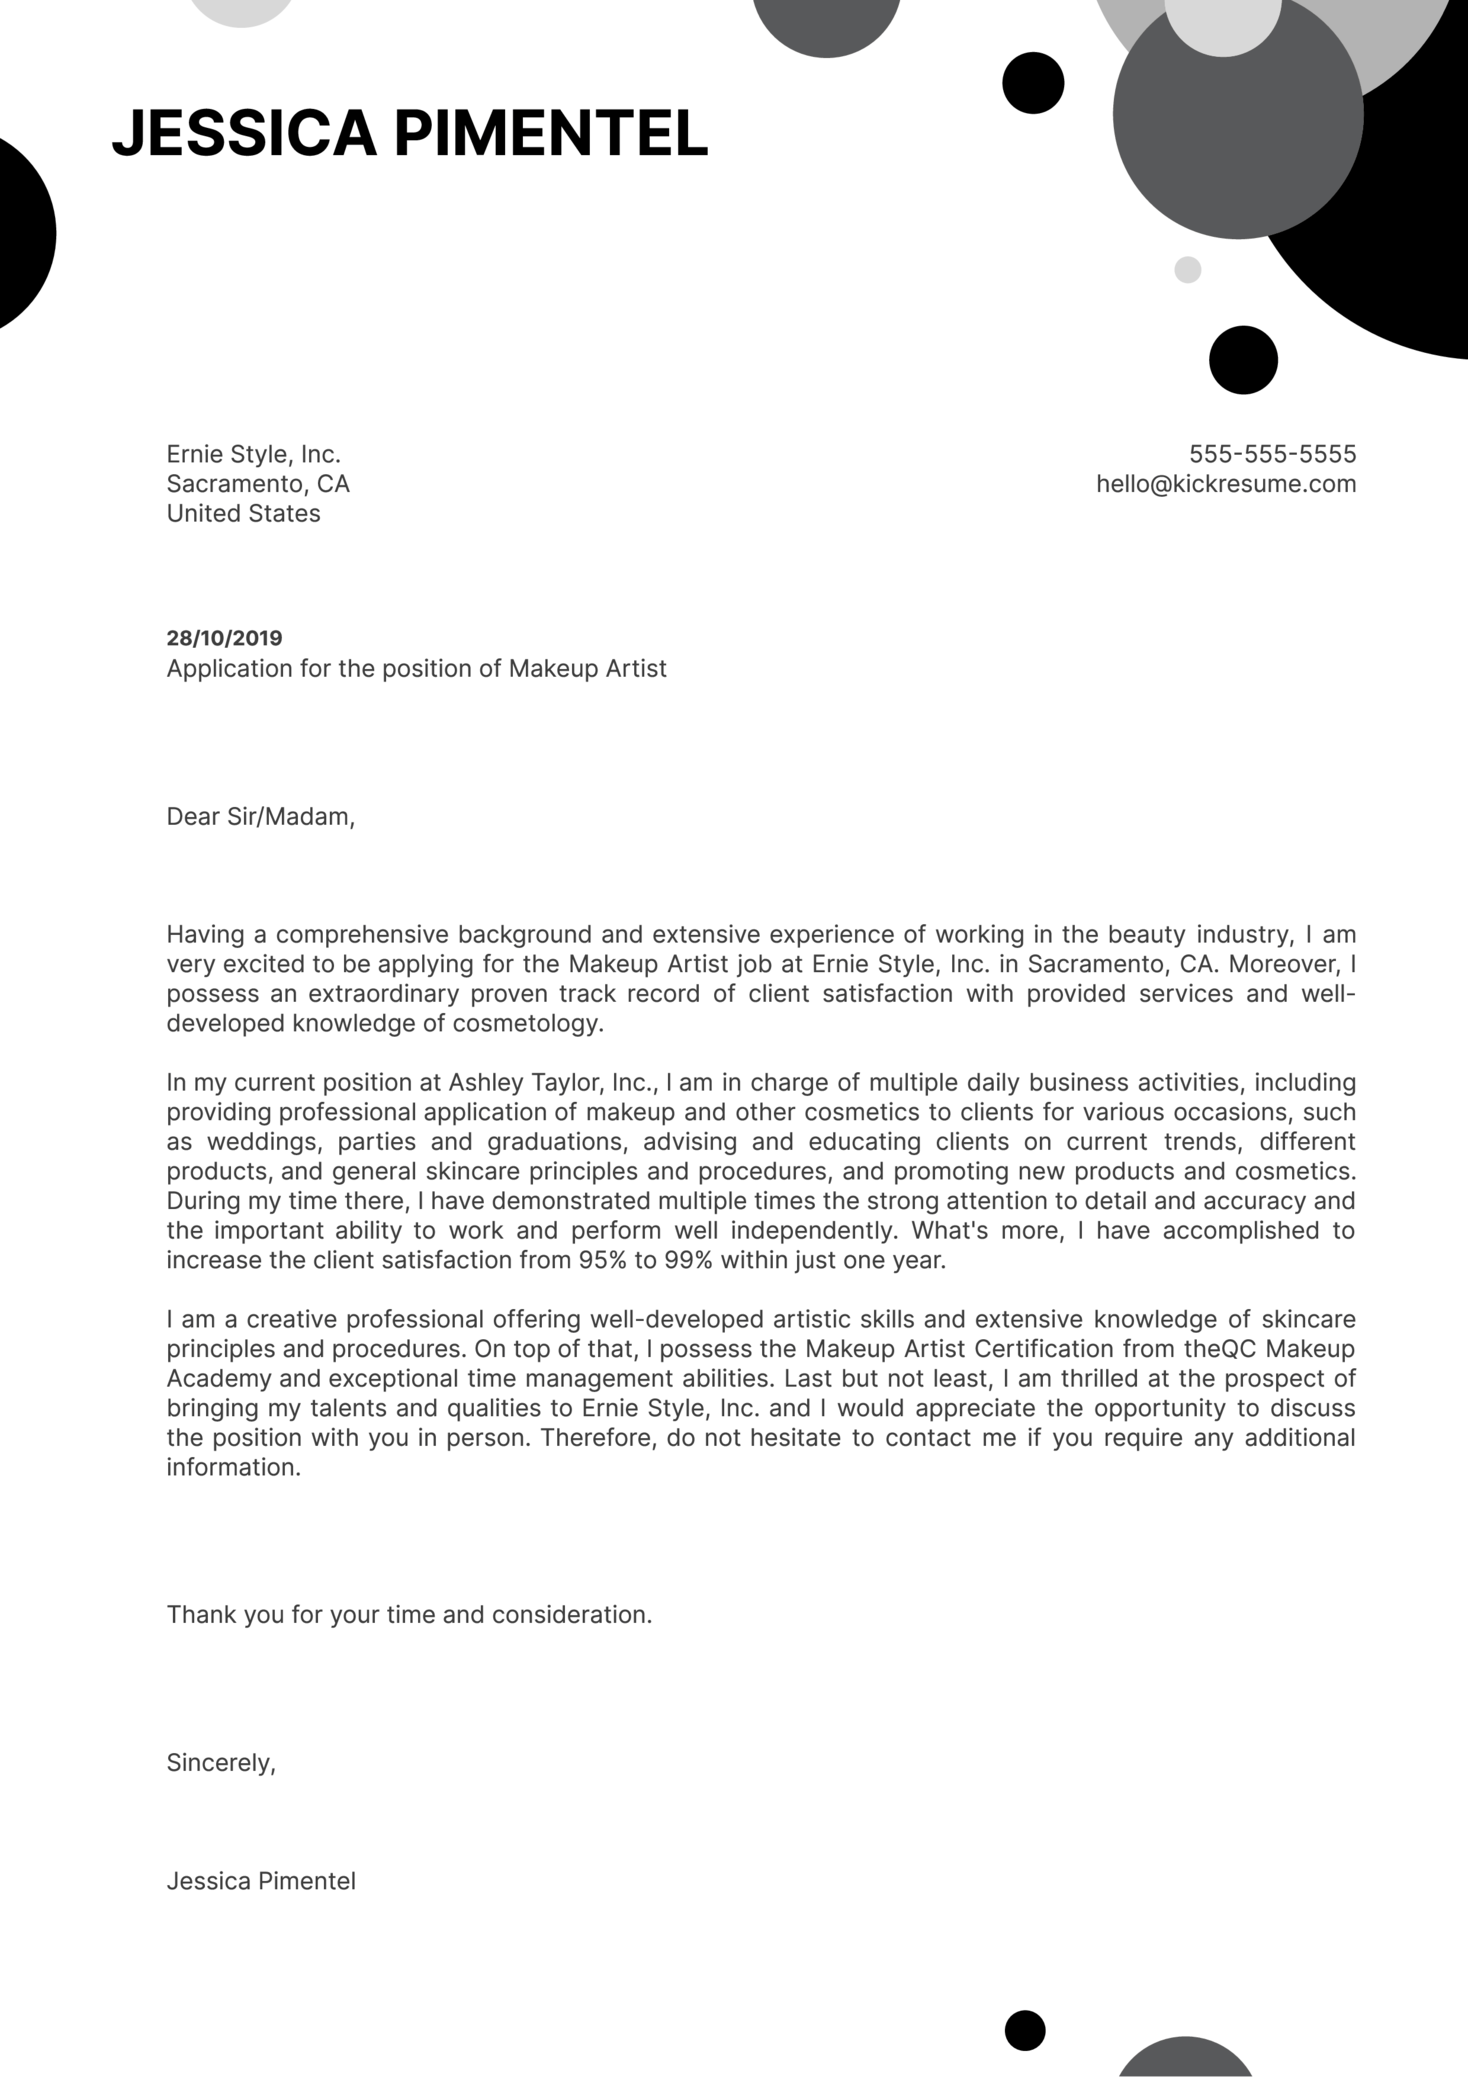 Makeup Artist Cover Letter Example | Kickresume